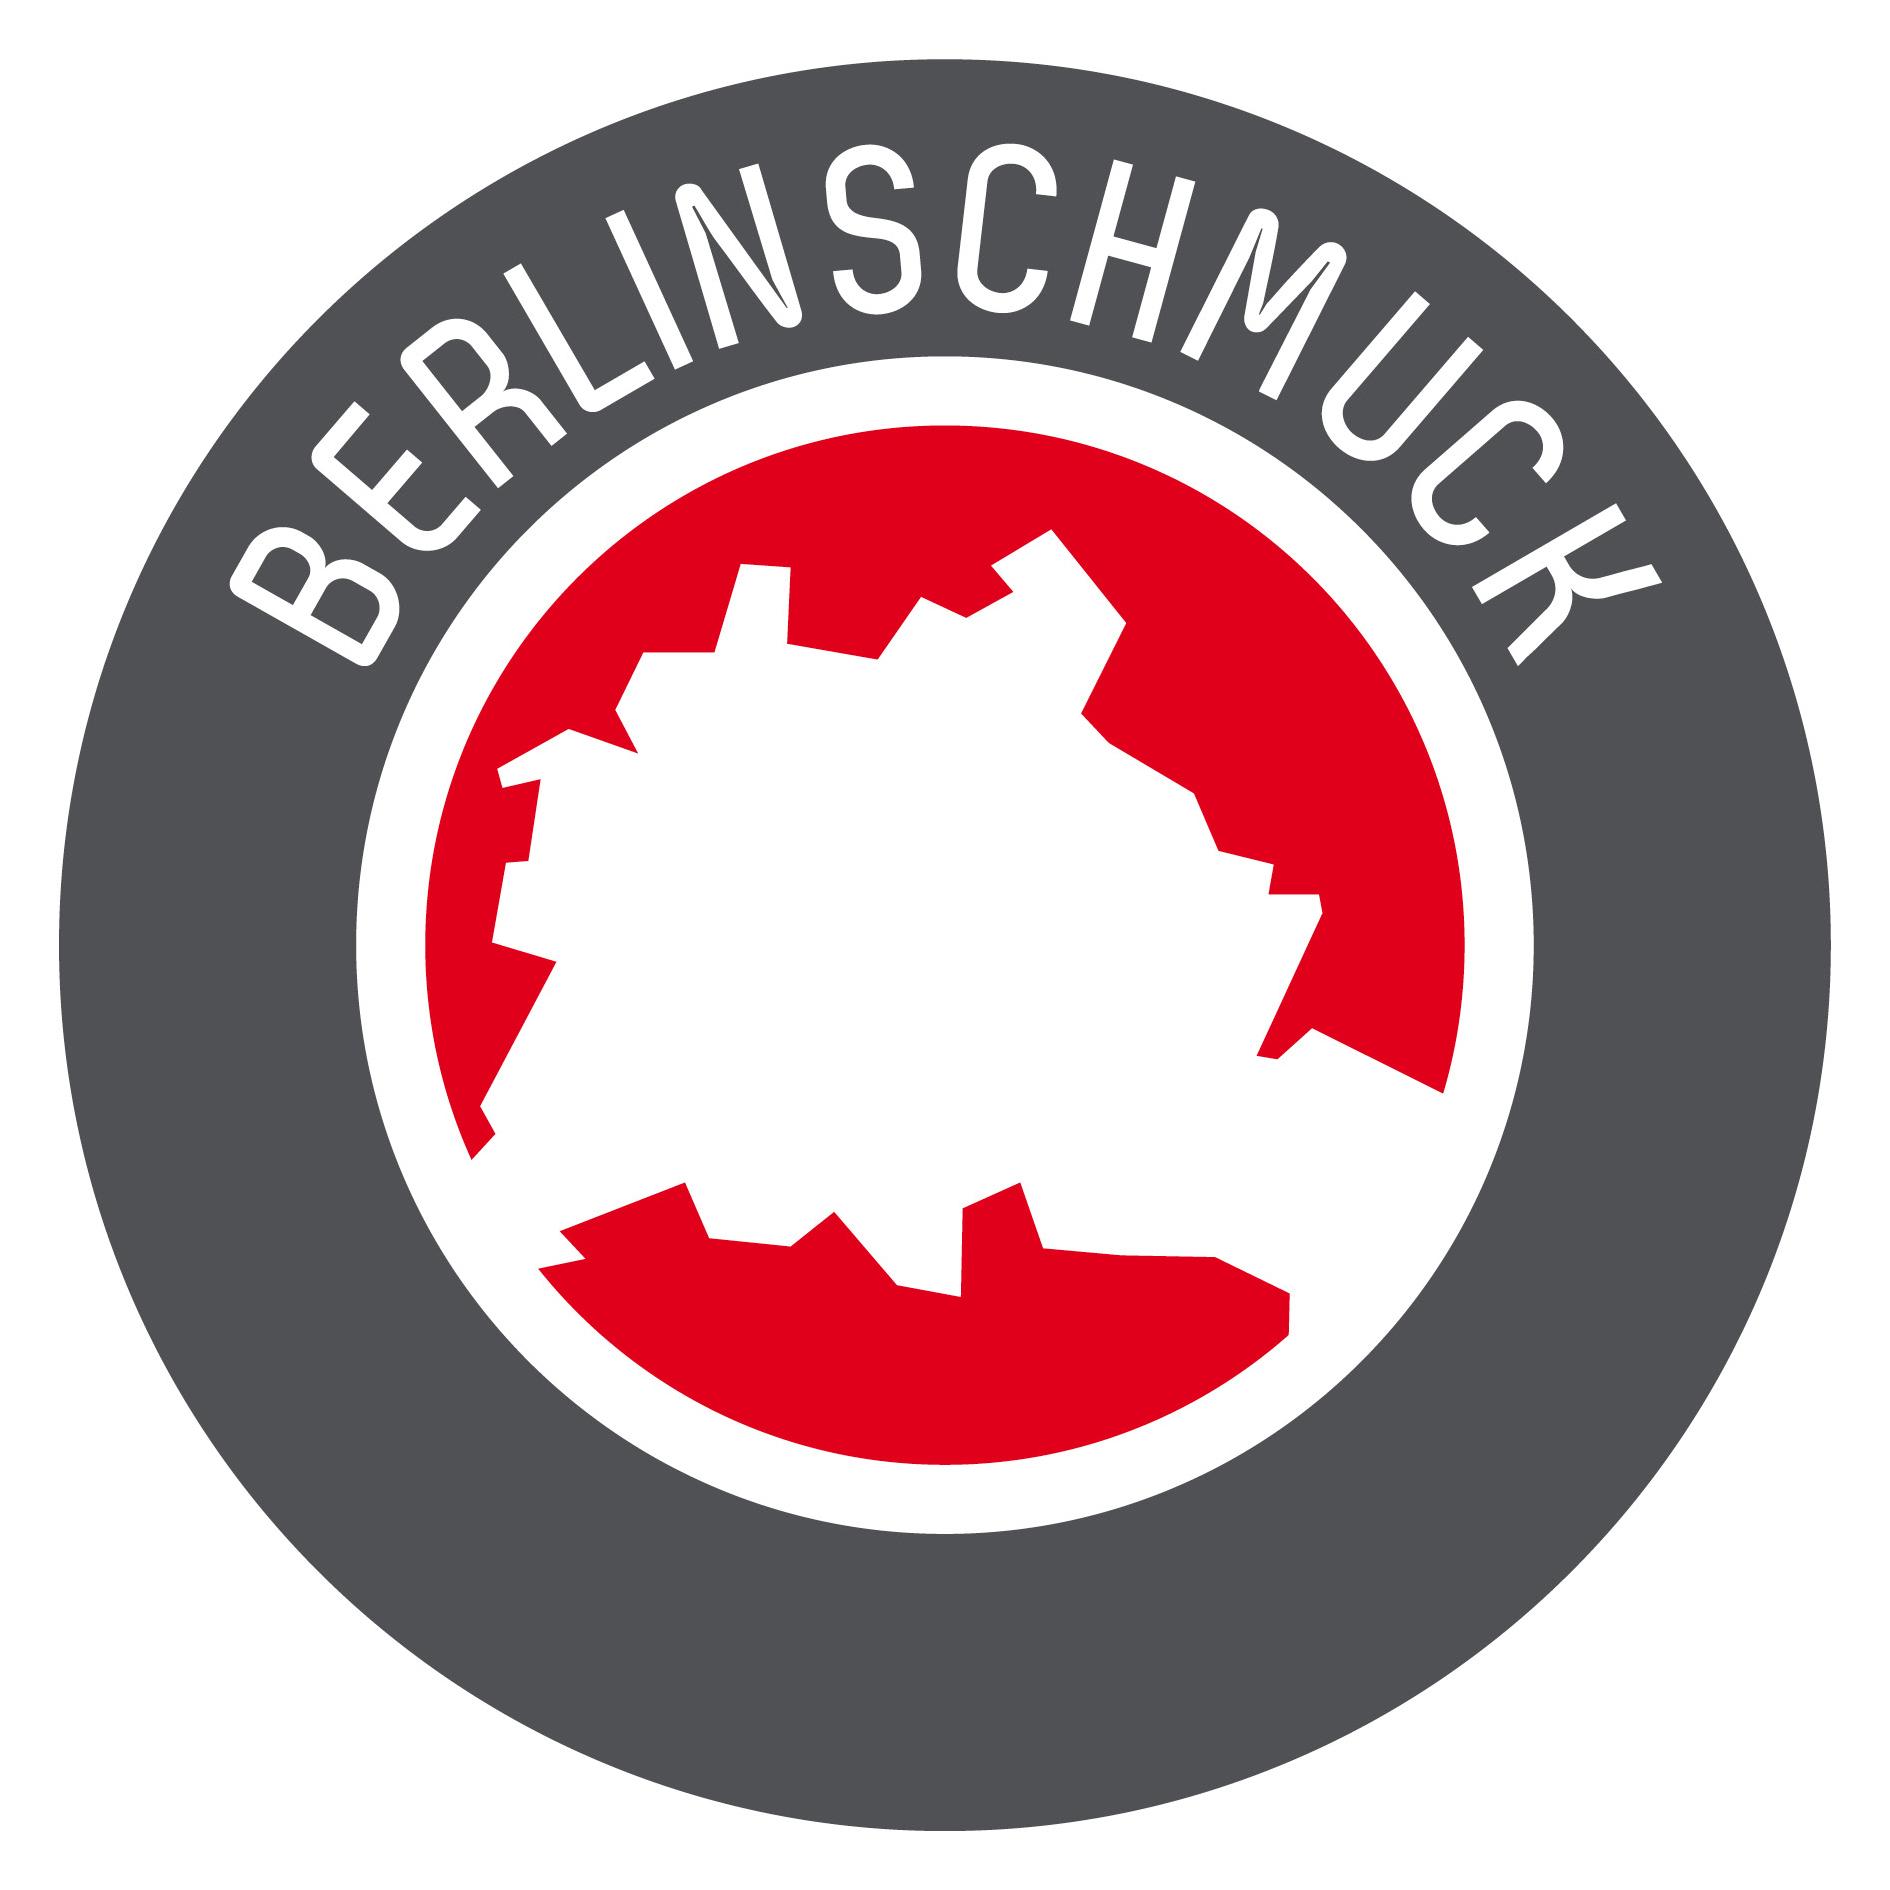 Berlin Schmuck